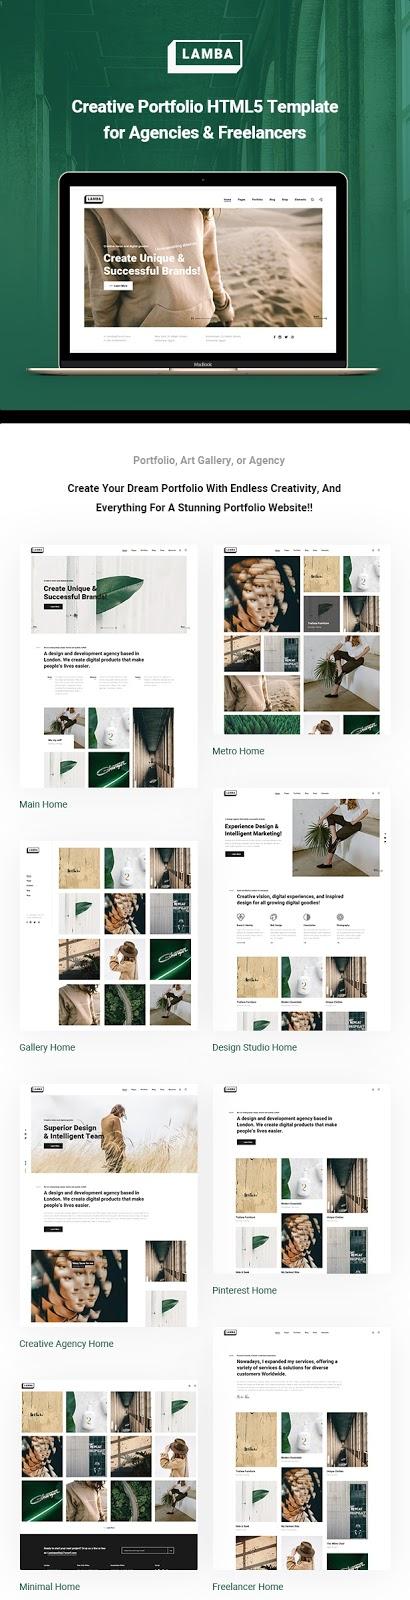 Creative Portfolio & Agency HTML5 Template